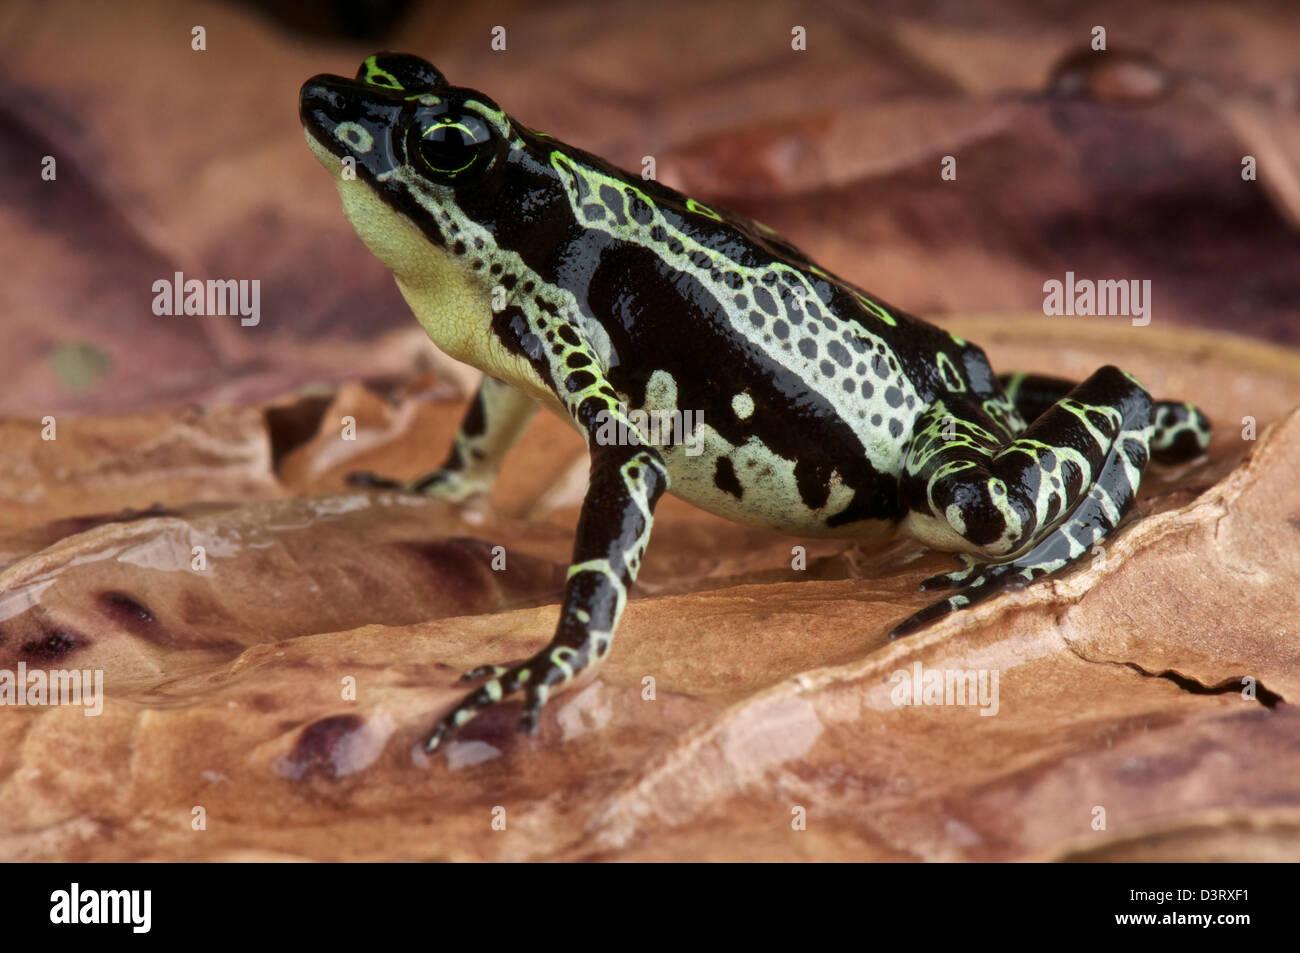 Stubfood toad / Atelopus spumarius - Stock Image